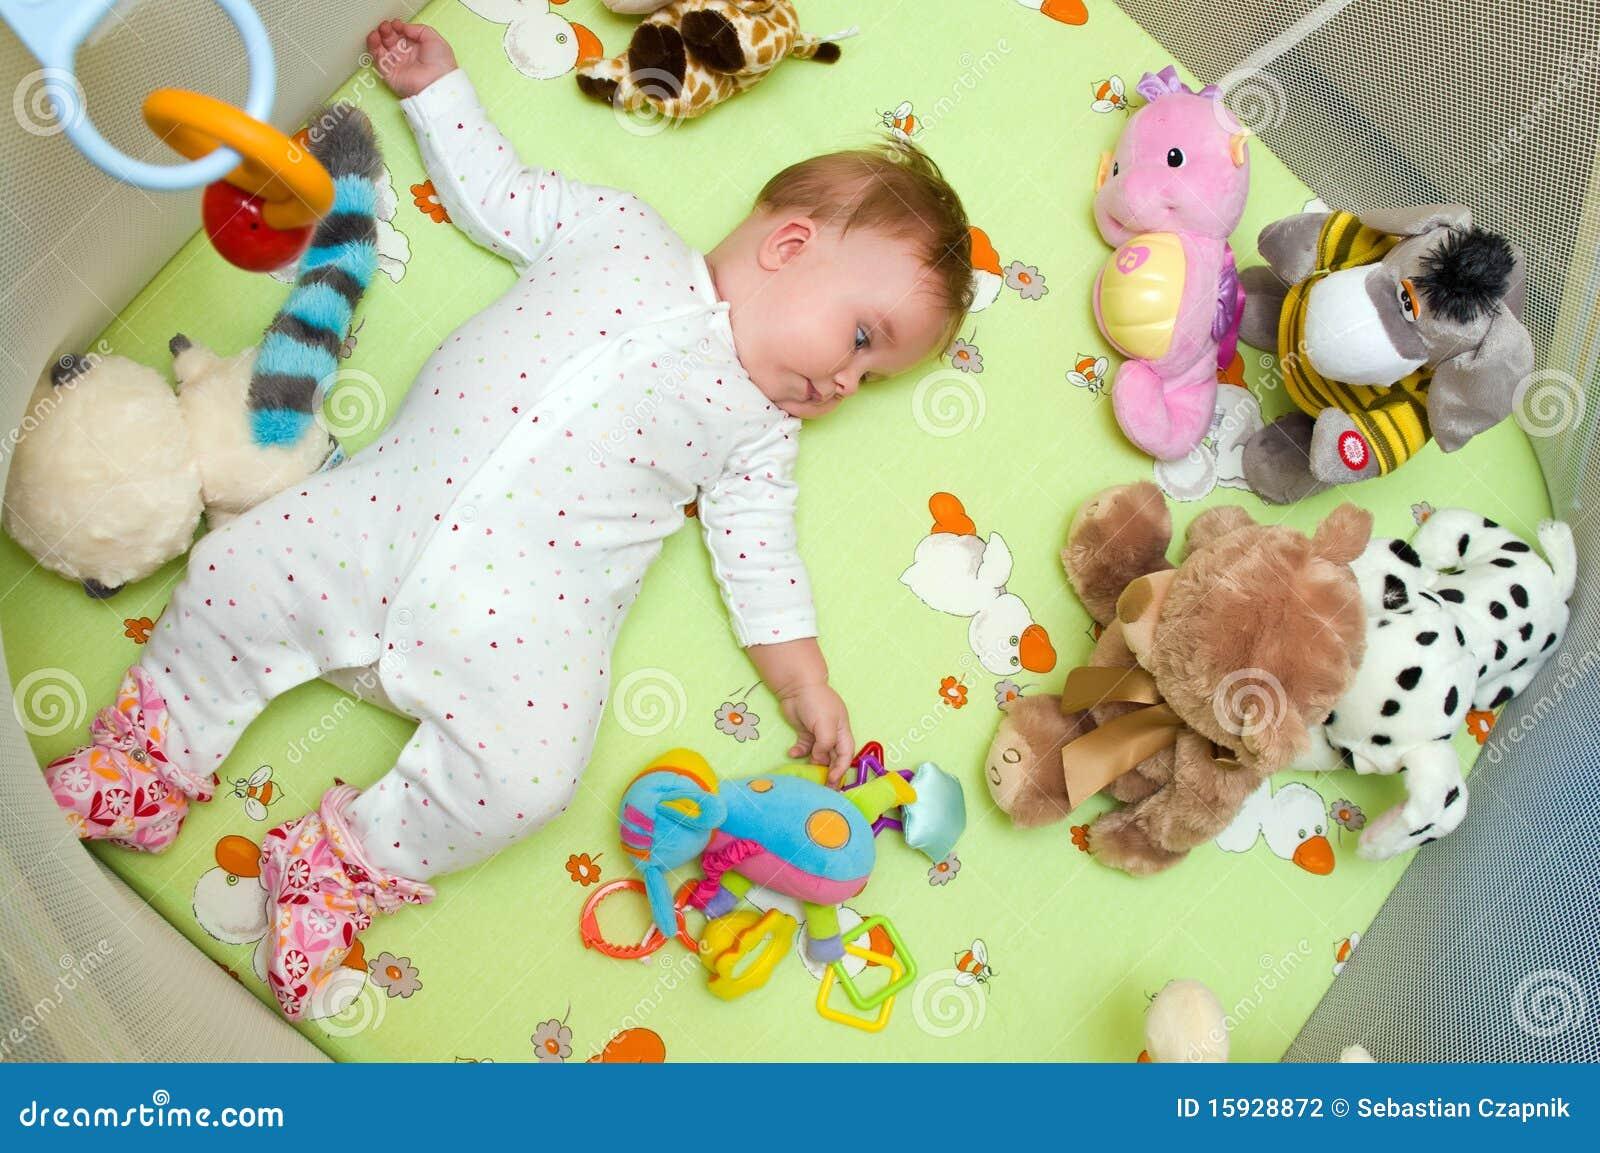 royaltyfree stock photo download baby in playpen